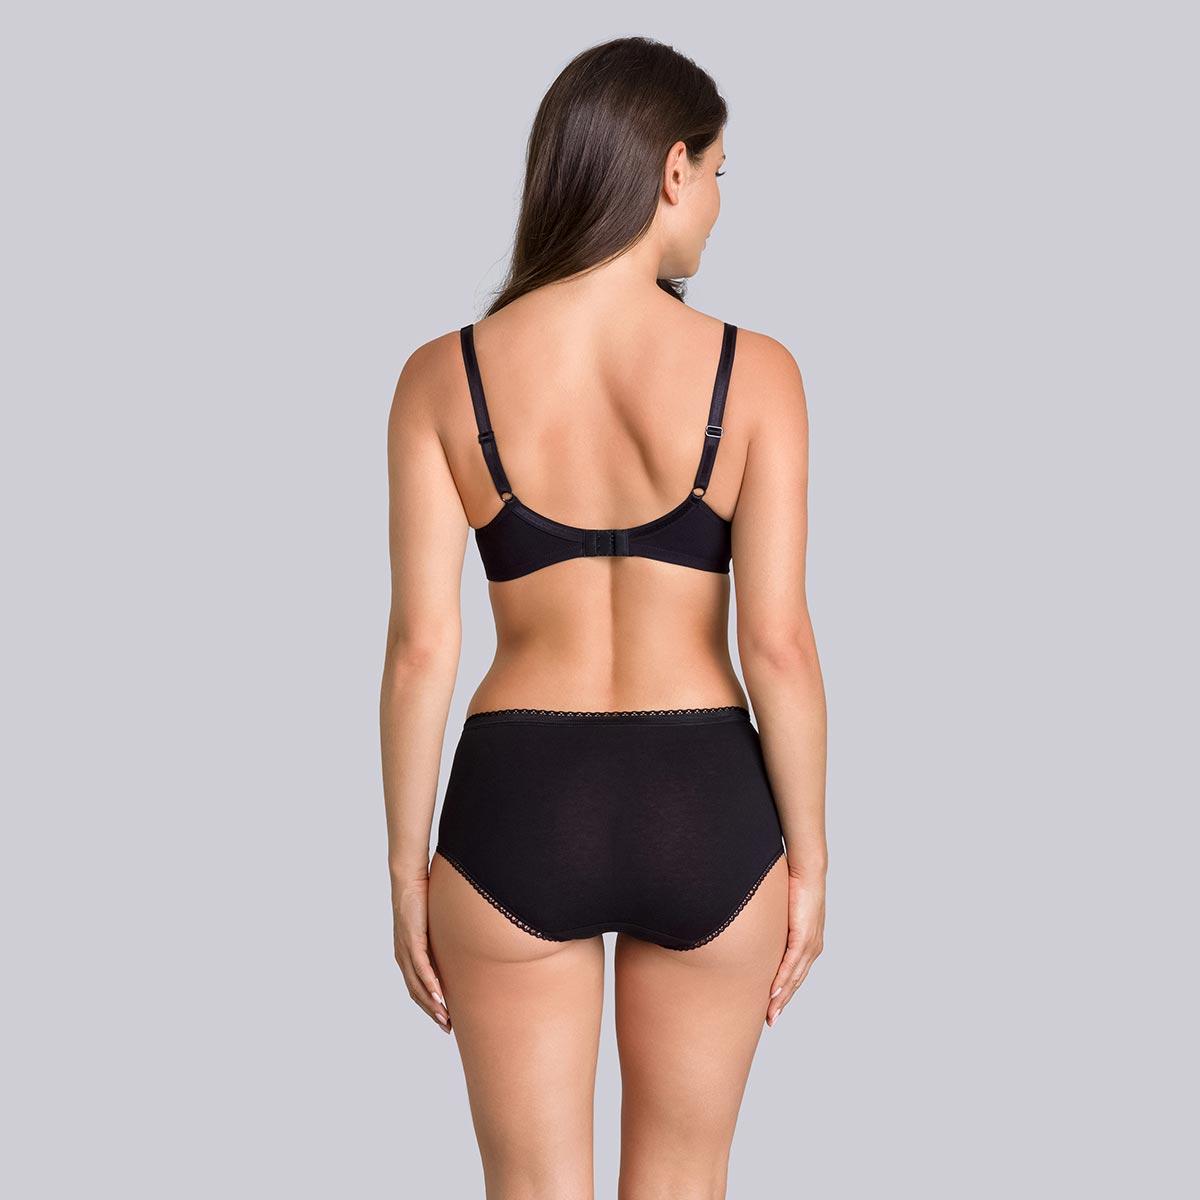 Non-wired cotton bra in black Cotton Support, , PLAYTEX